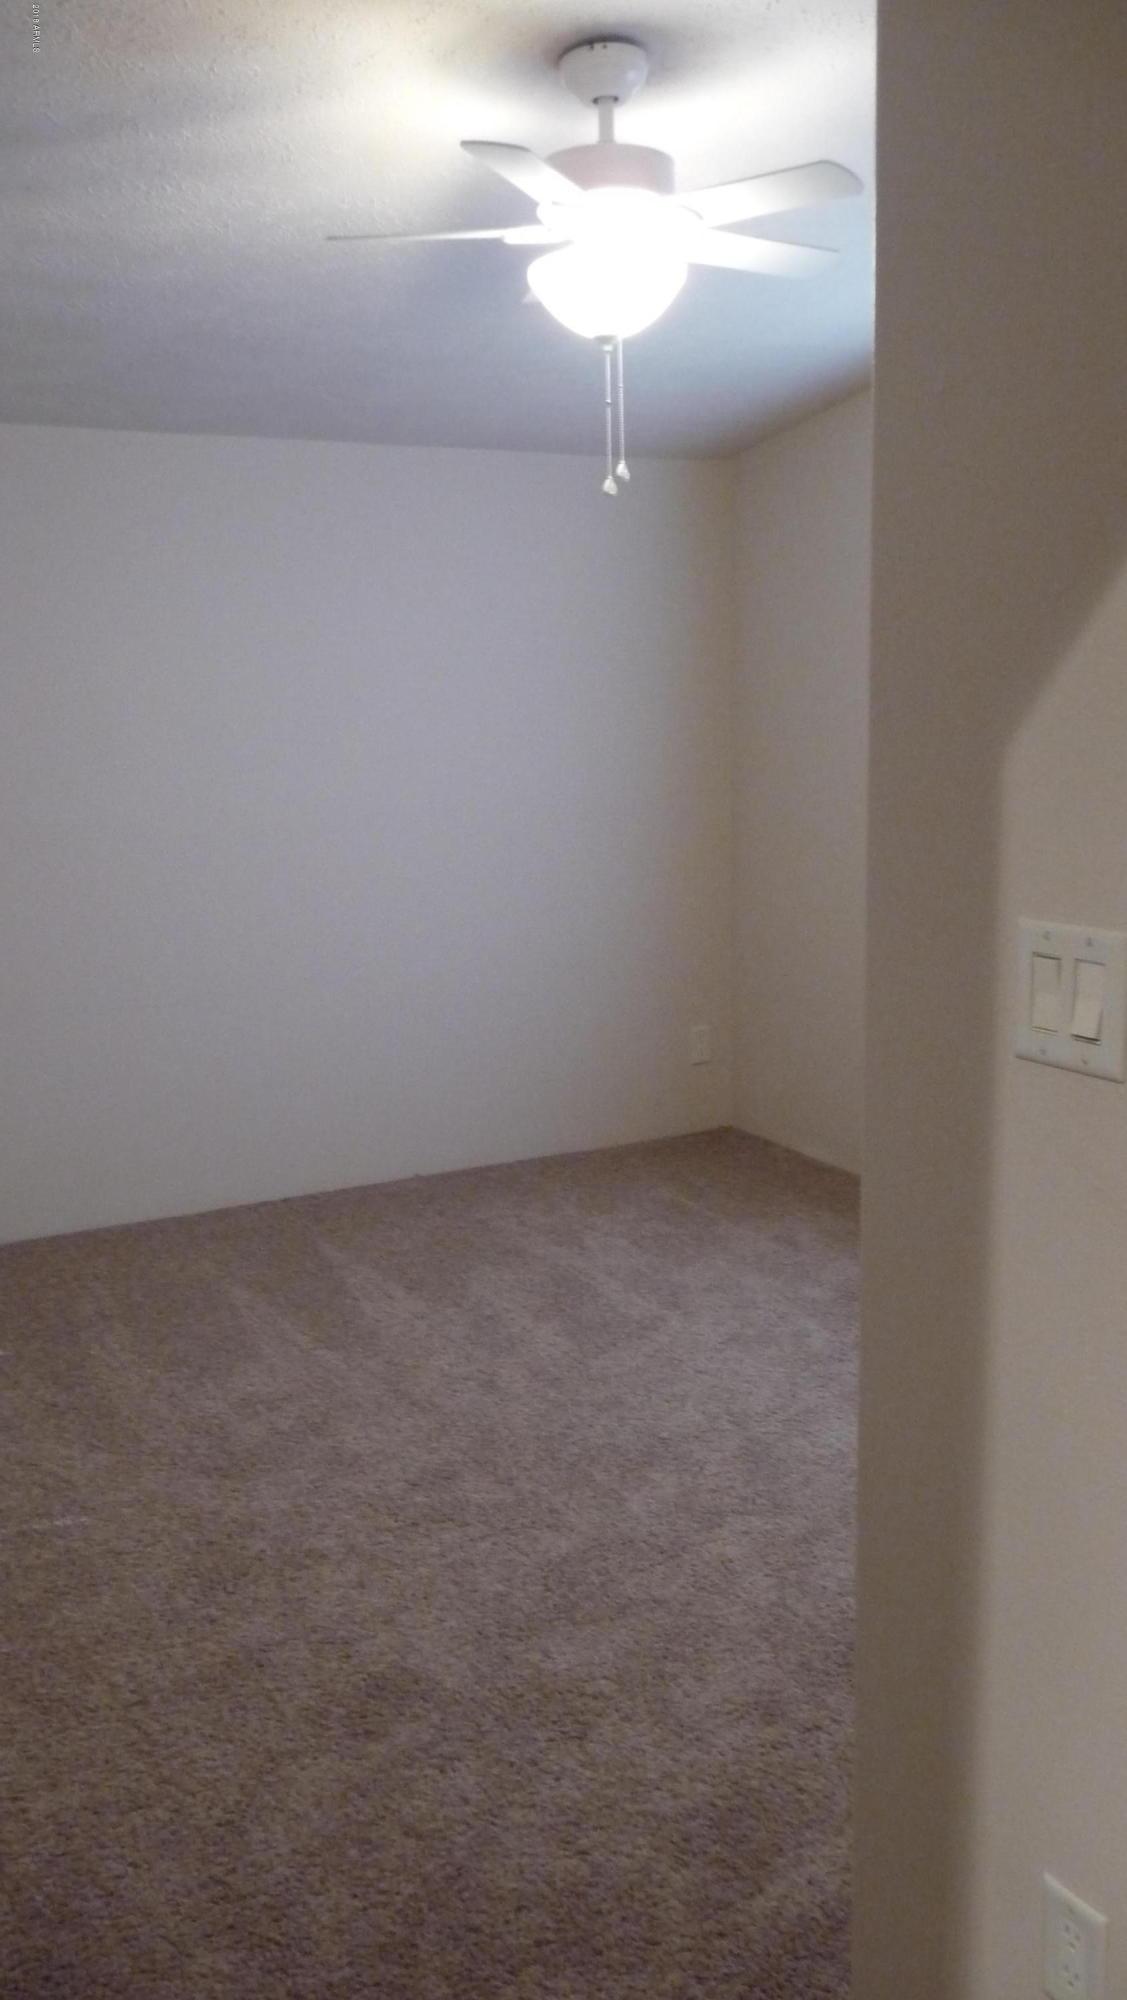 MLS 5819260 7660 E MCKELLIPS Road Unit 27, Scottsdale, AZ 85257 Scottsdale AZ Short Sale